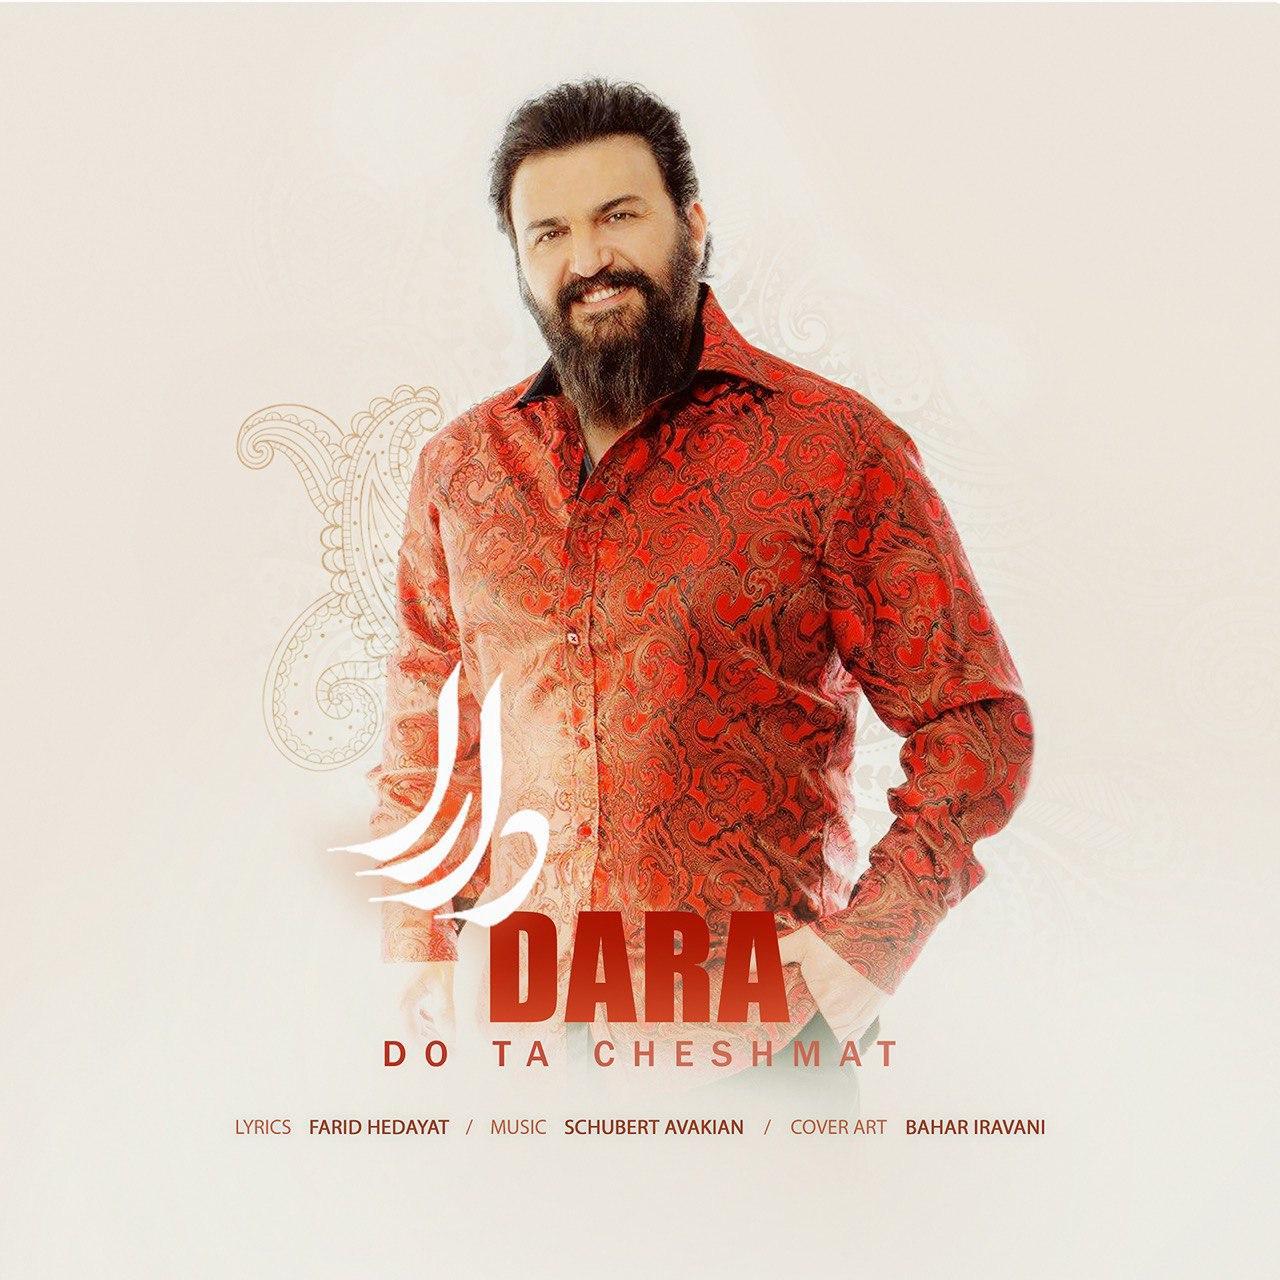 Dara Recording Artist – Do Ta Cheshmat